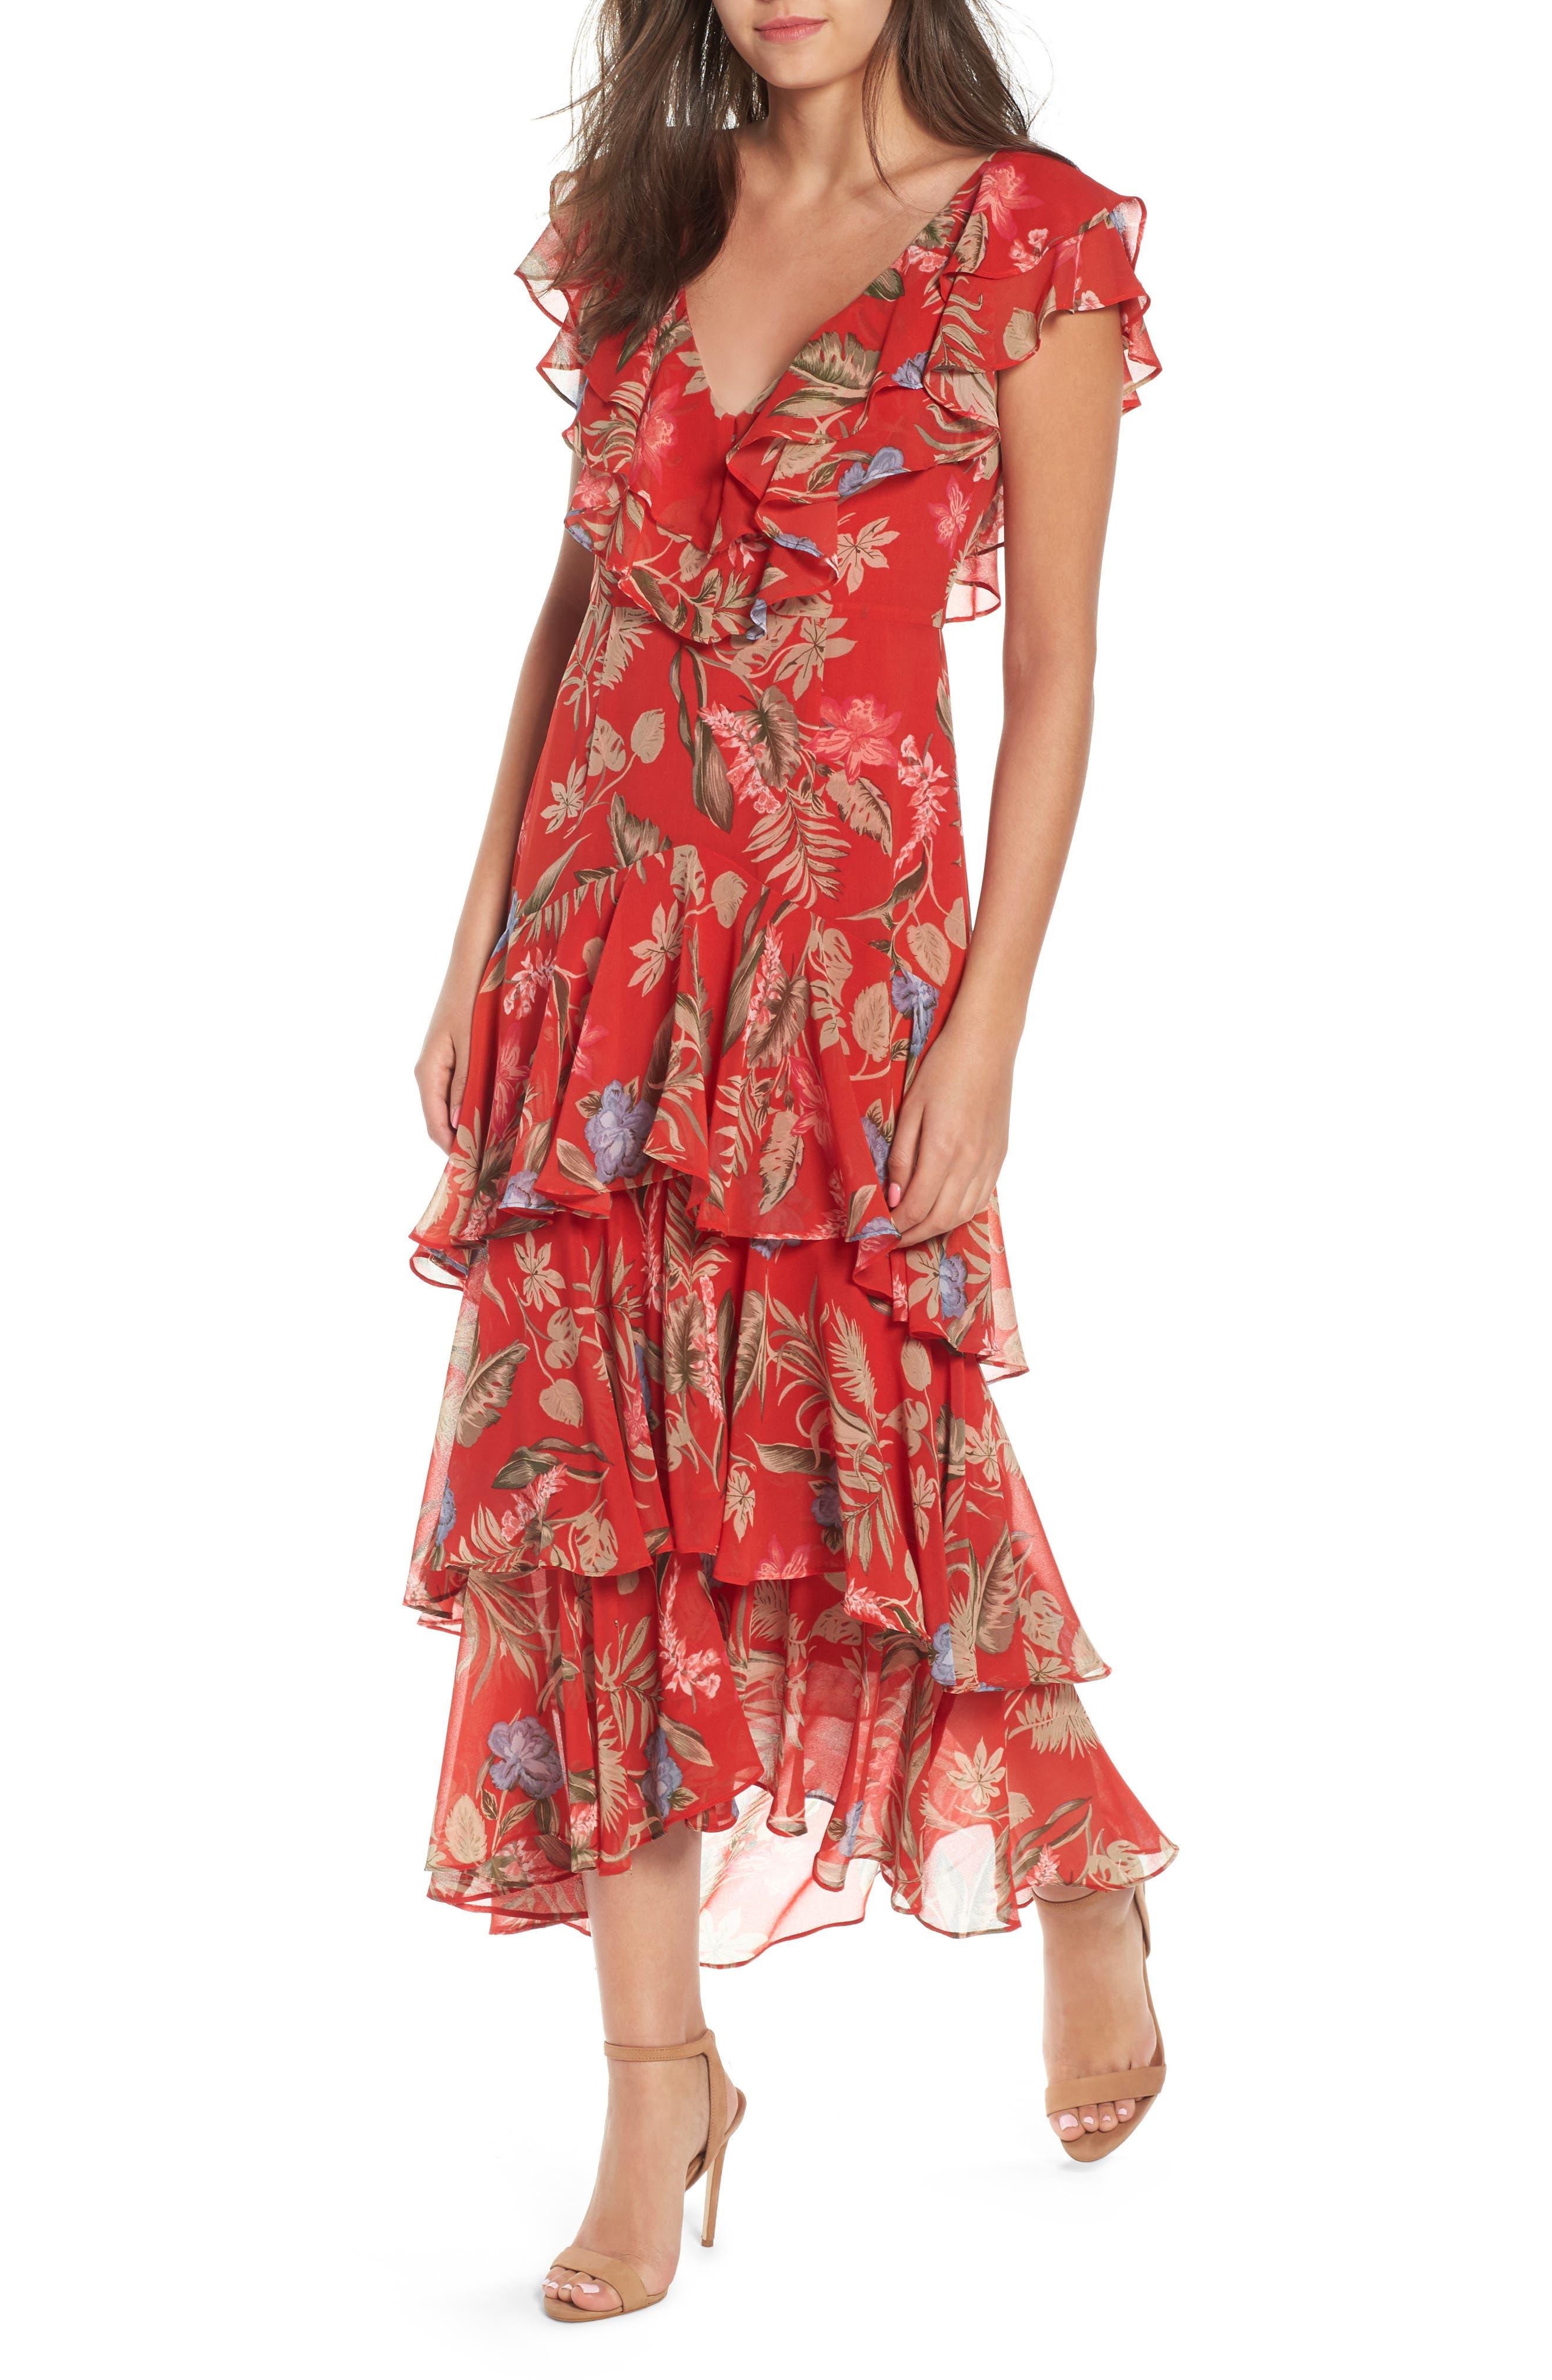 Chelsea Tiered Ruffle Maxi Dress,                         Main,                         color, 600